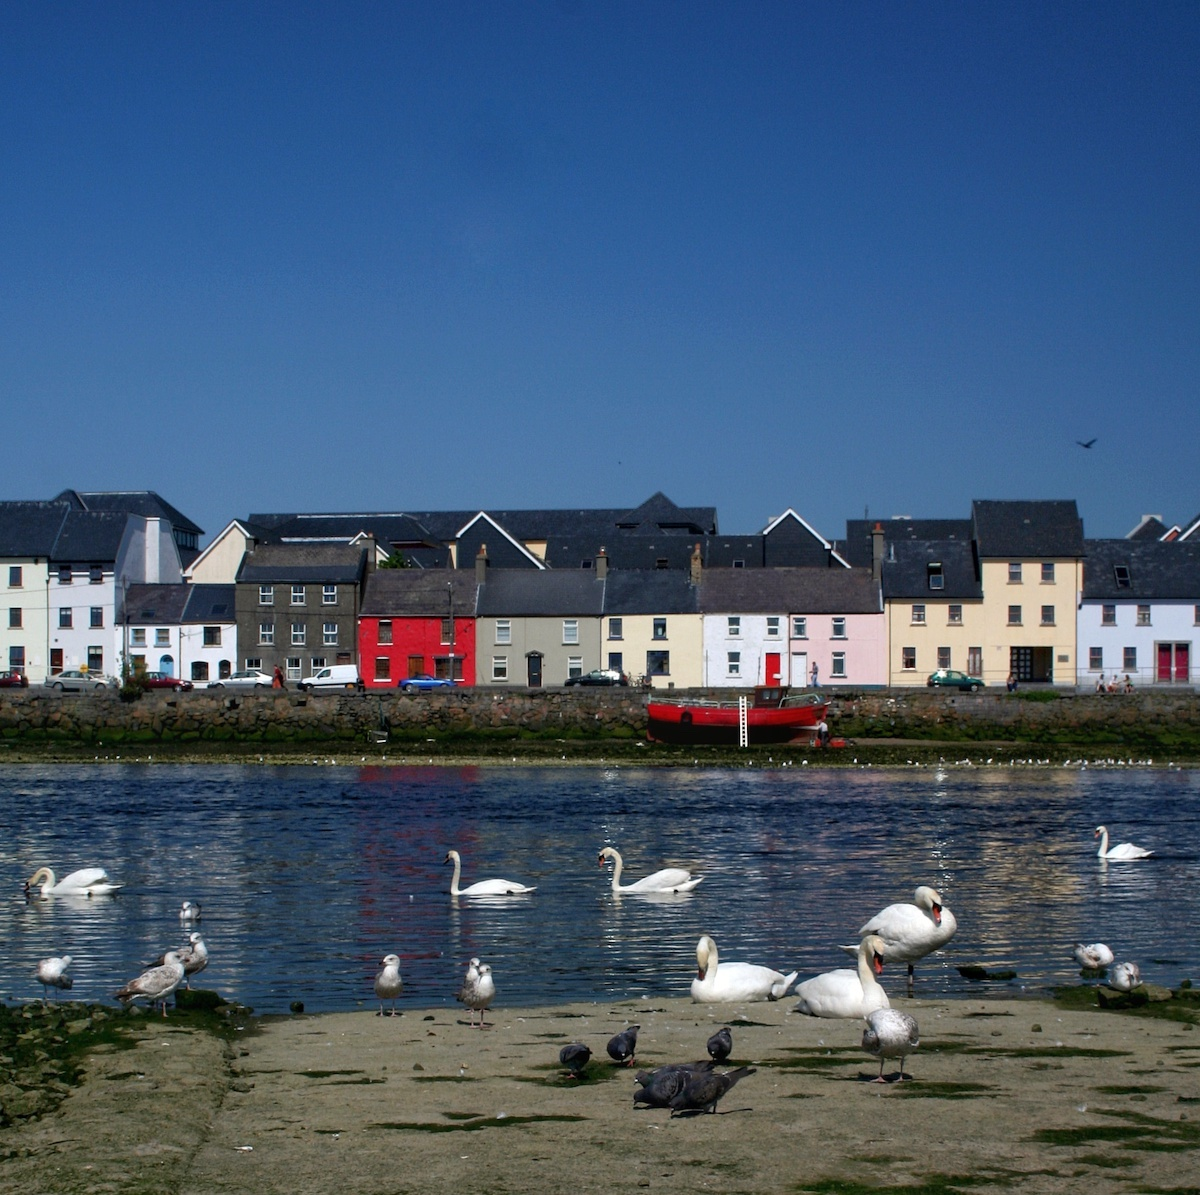 Galway ©phalinn CC BY 2.0